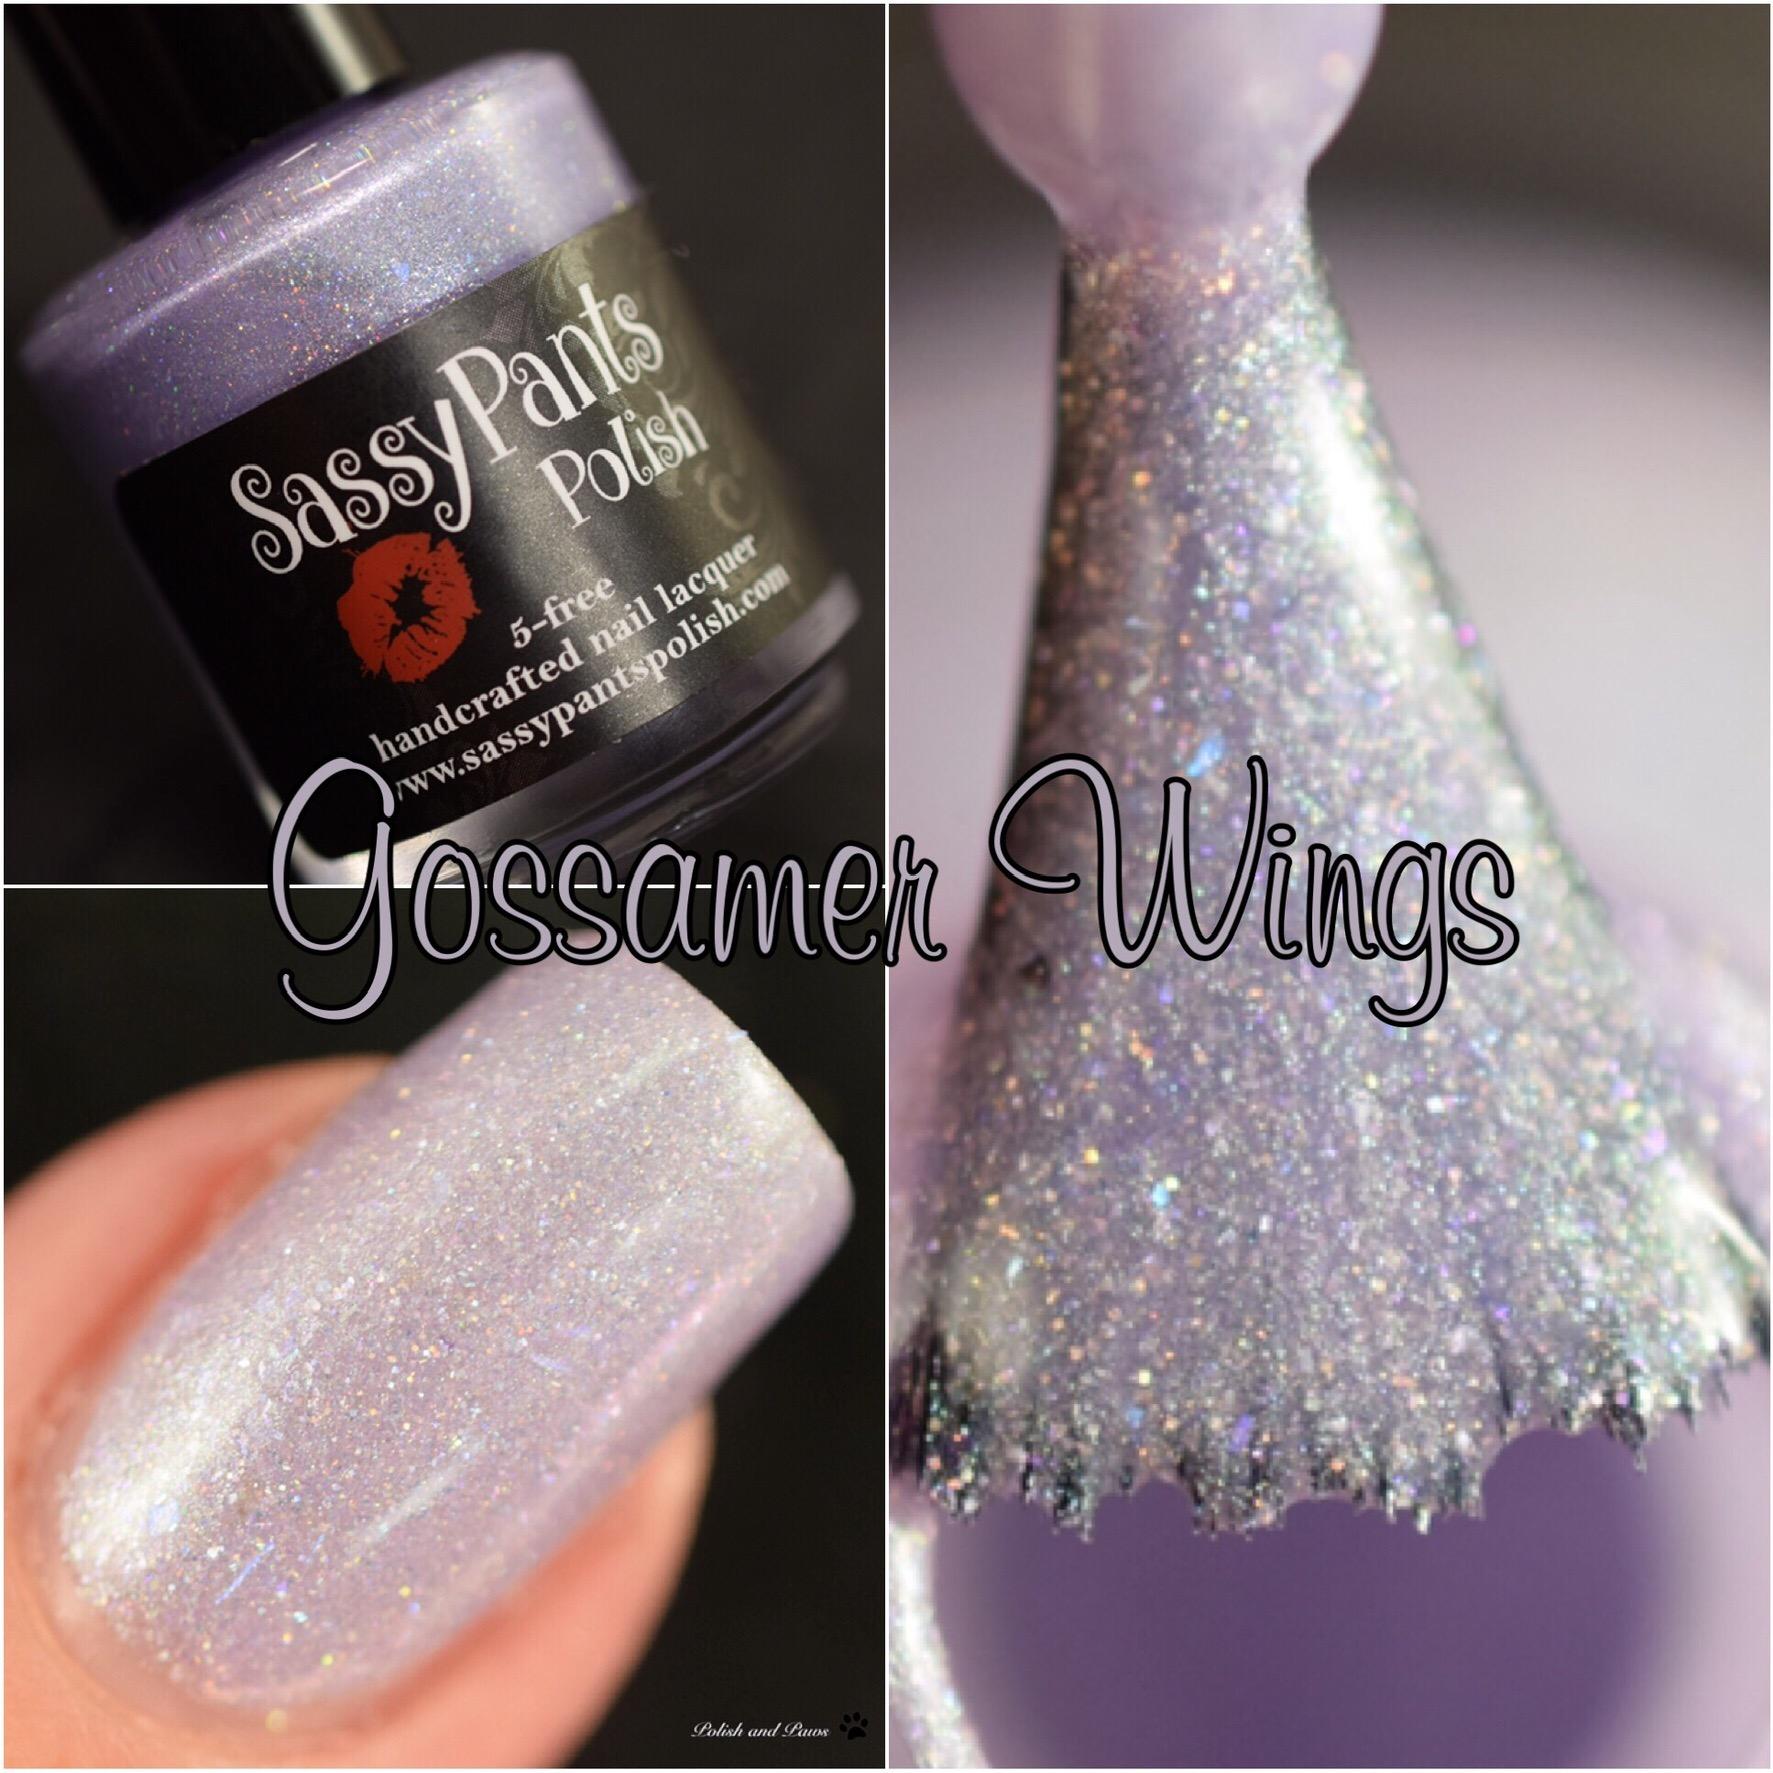 Sassy Pants Polish Gossamer Wings